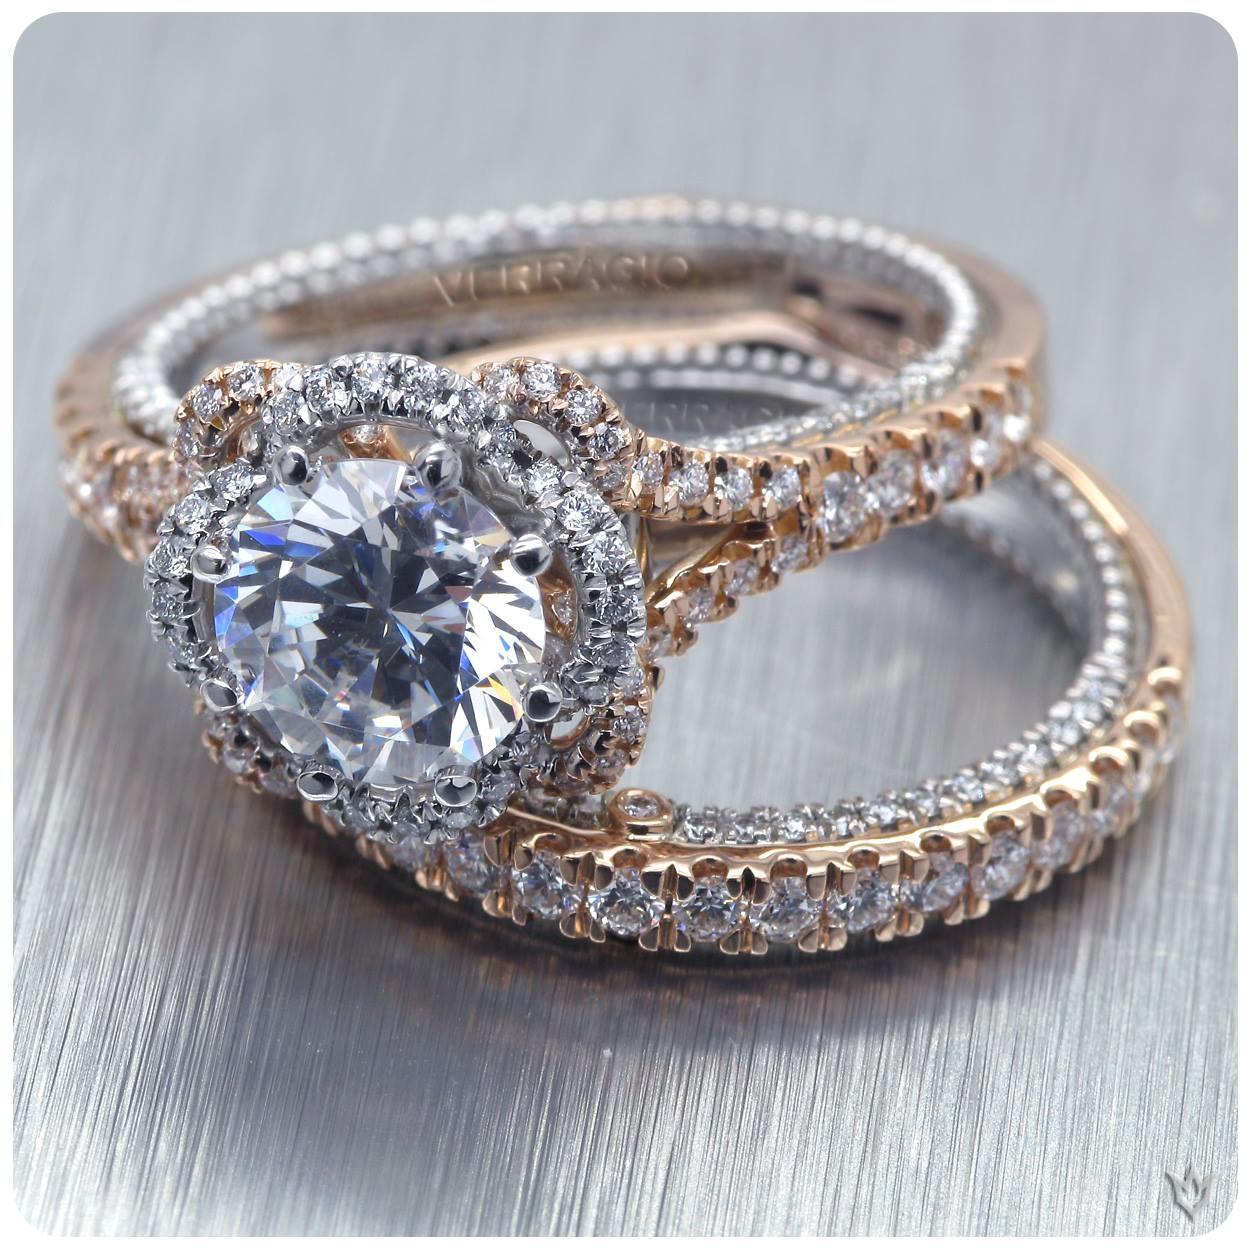 Emerald Lady Jewelry image 7